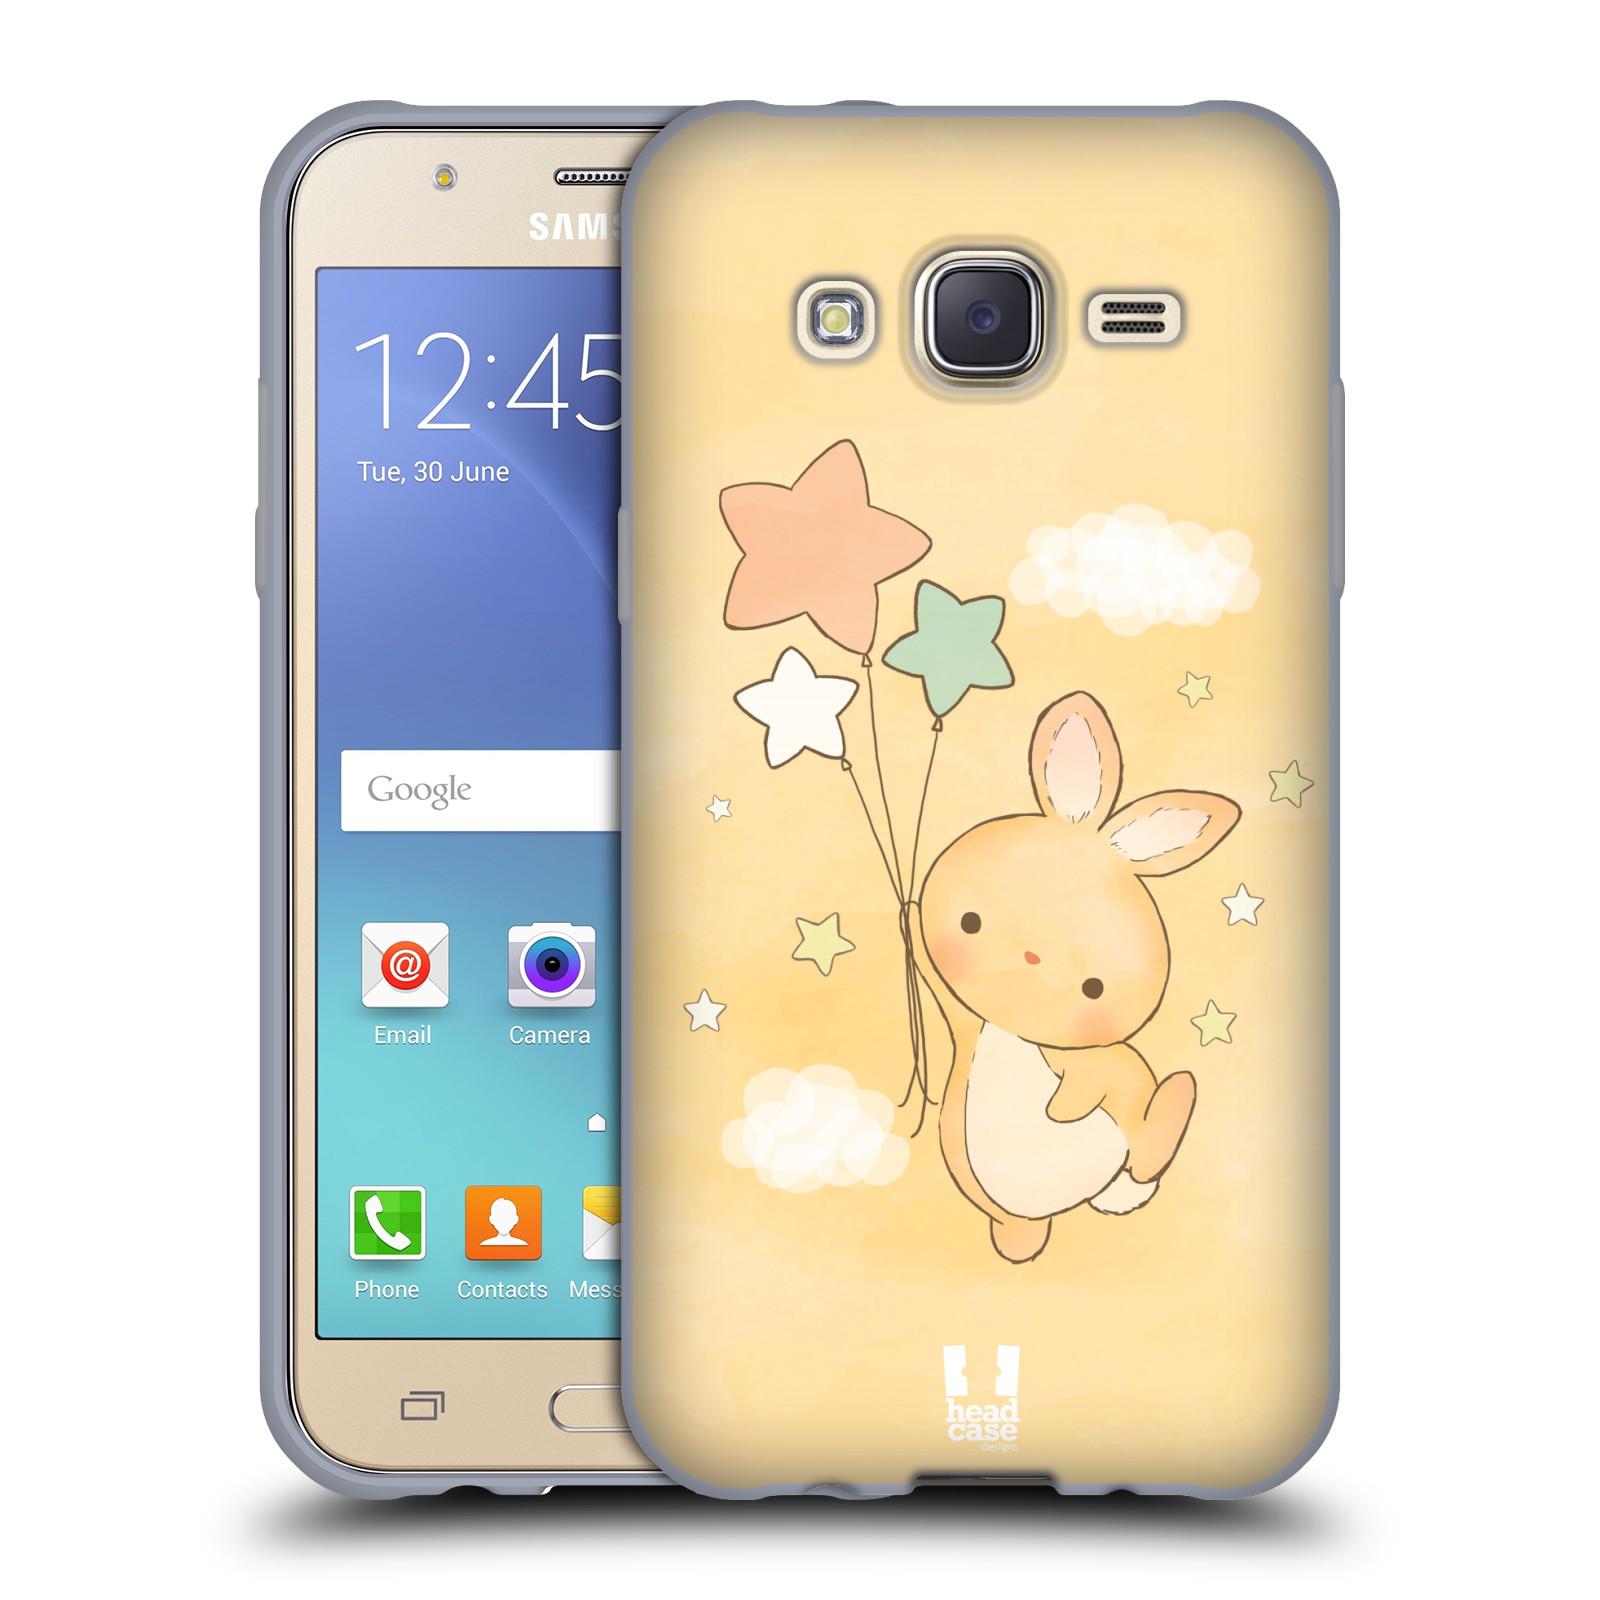 HEAD CASE silikonový obal na mobil Samsung Galaxy J5, J500, (J5 DUOS) vzor králíček a hvězdy žlutá